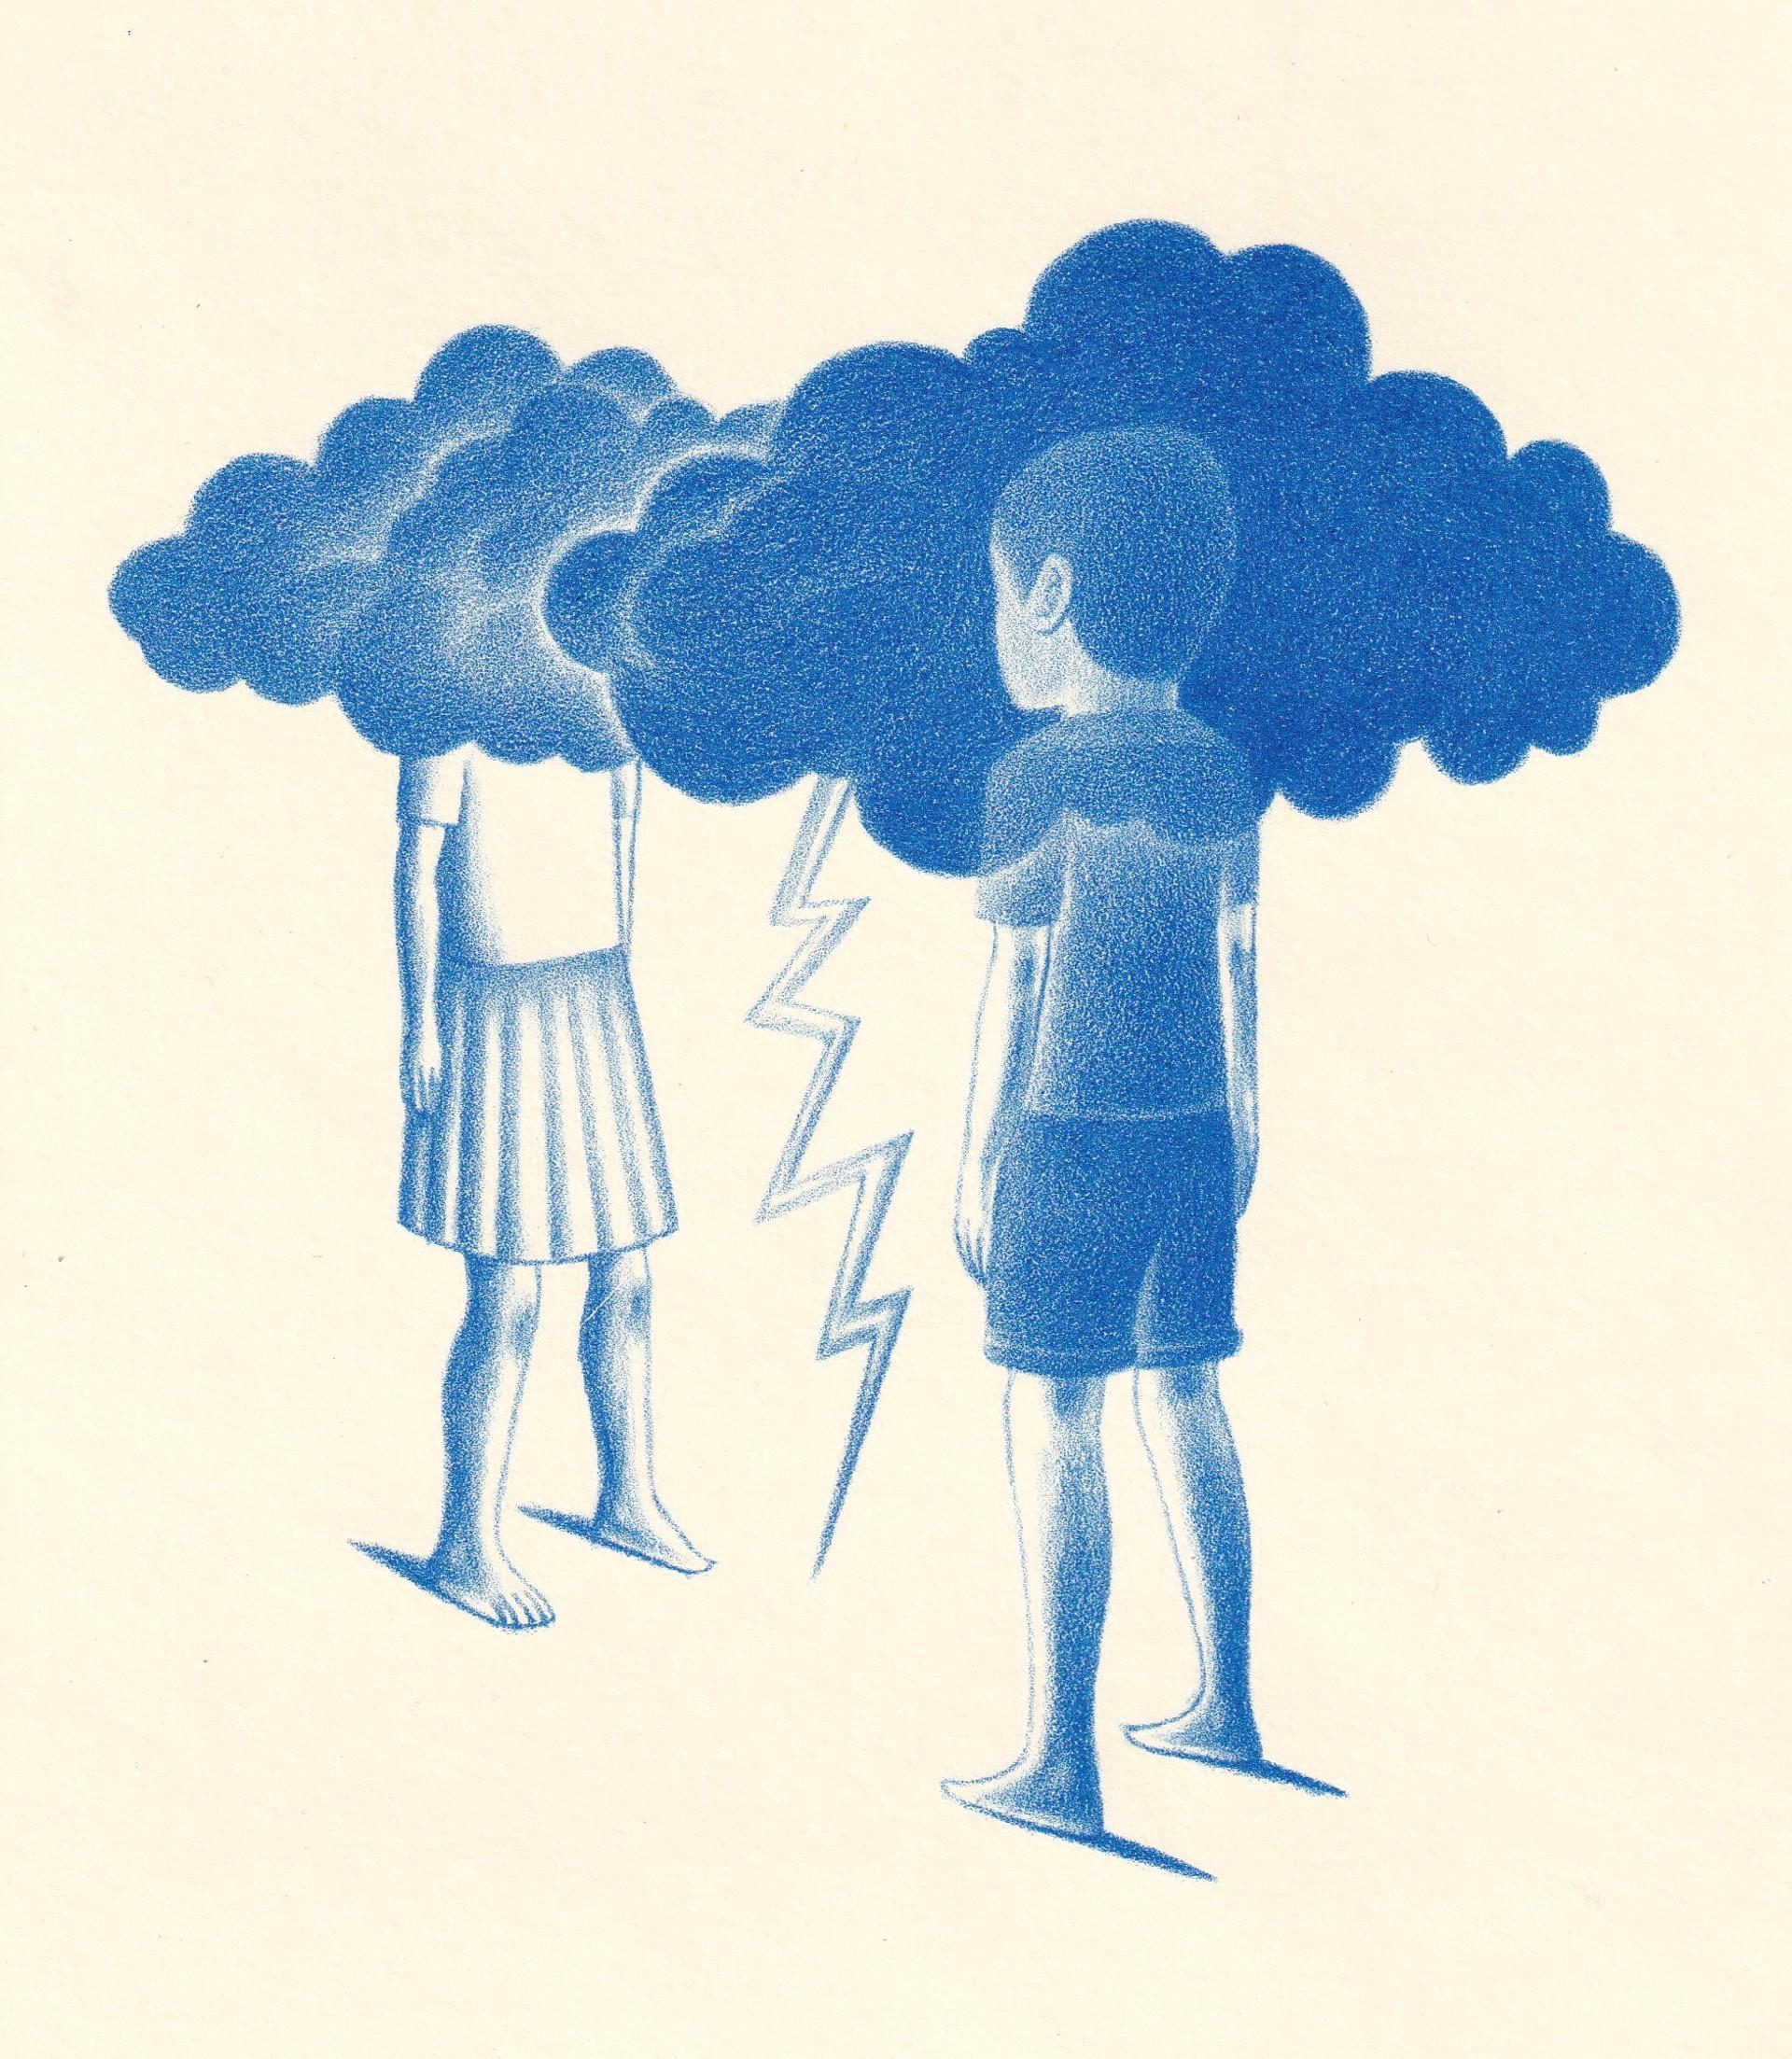 Untitled (Niños Nubes) by Alberto Cruz